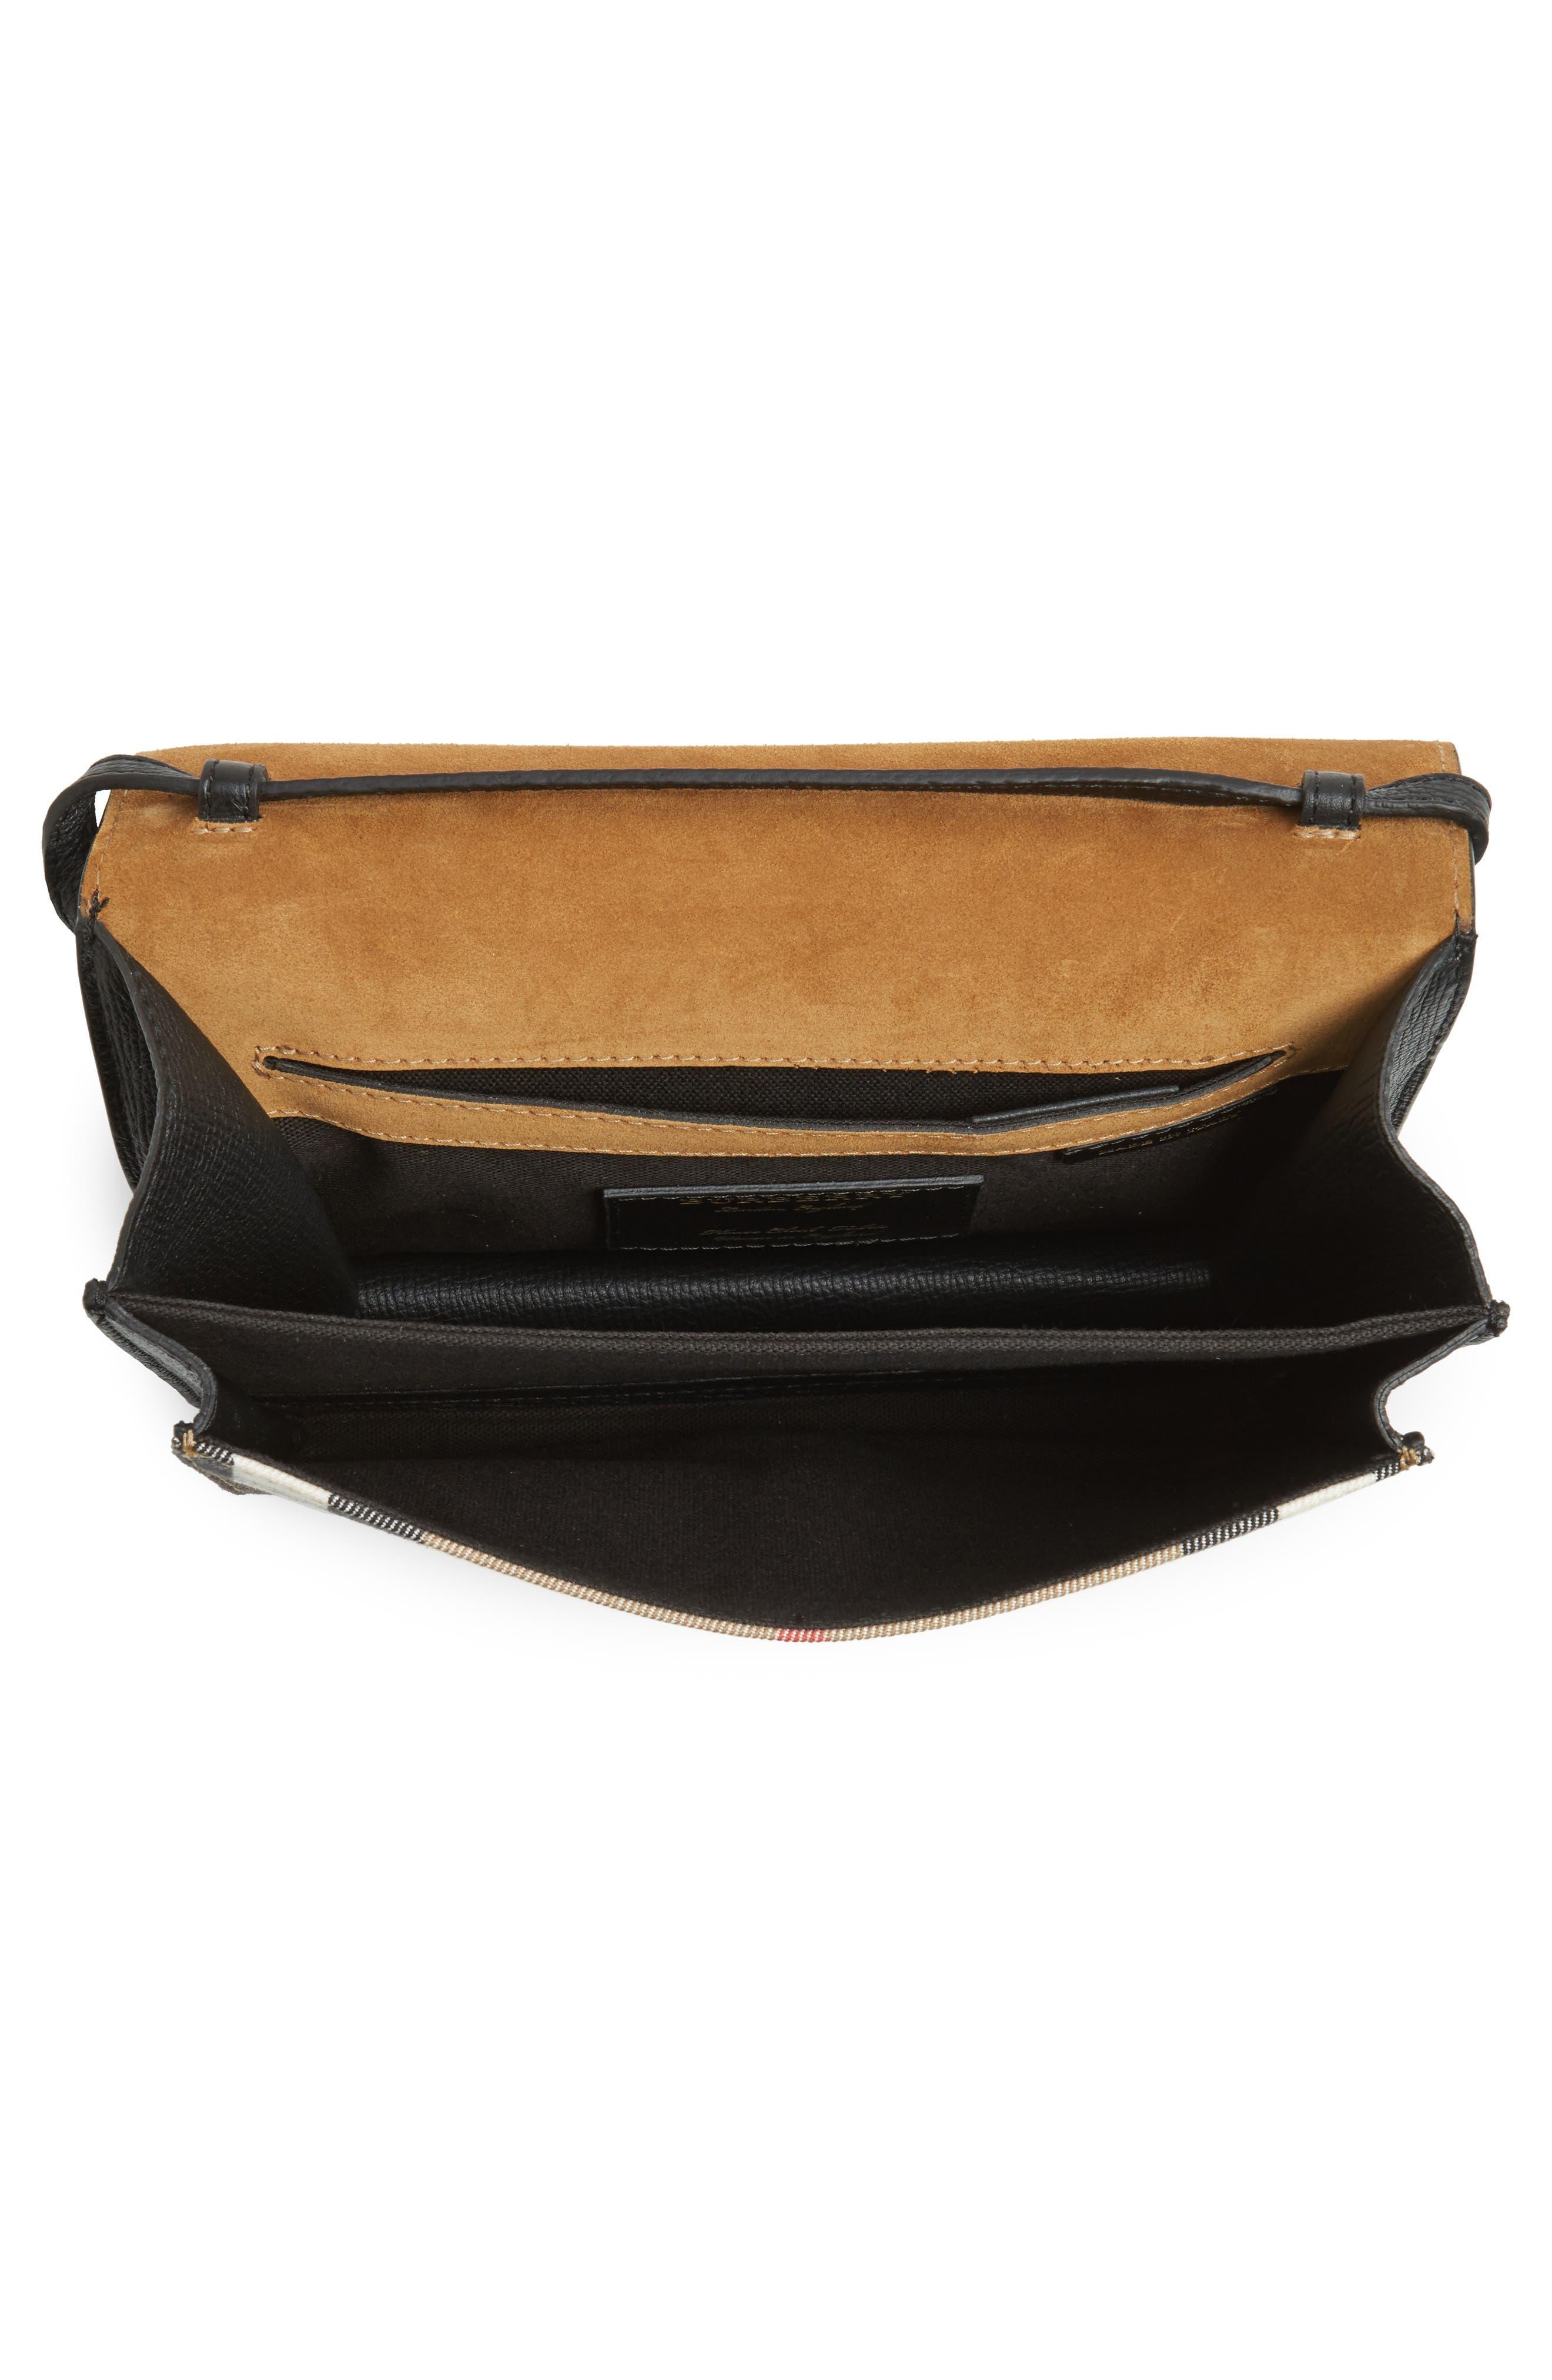 'Small Macken' Check Crossbody Bag,                             Alternate thumbnail 4, color,                             BLACK